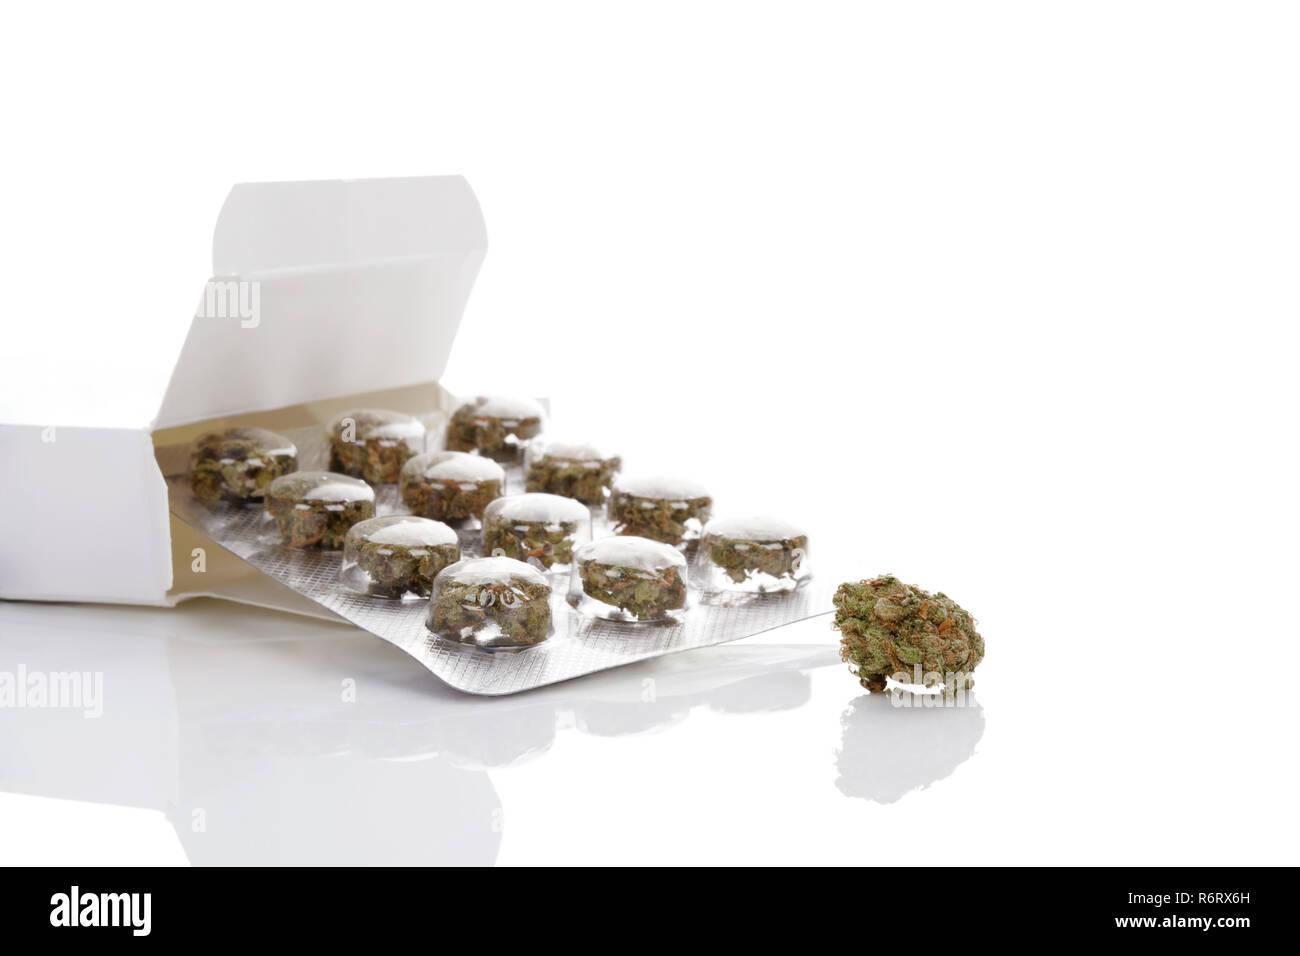 Medical cannabis. - Stock Image